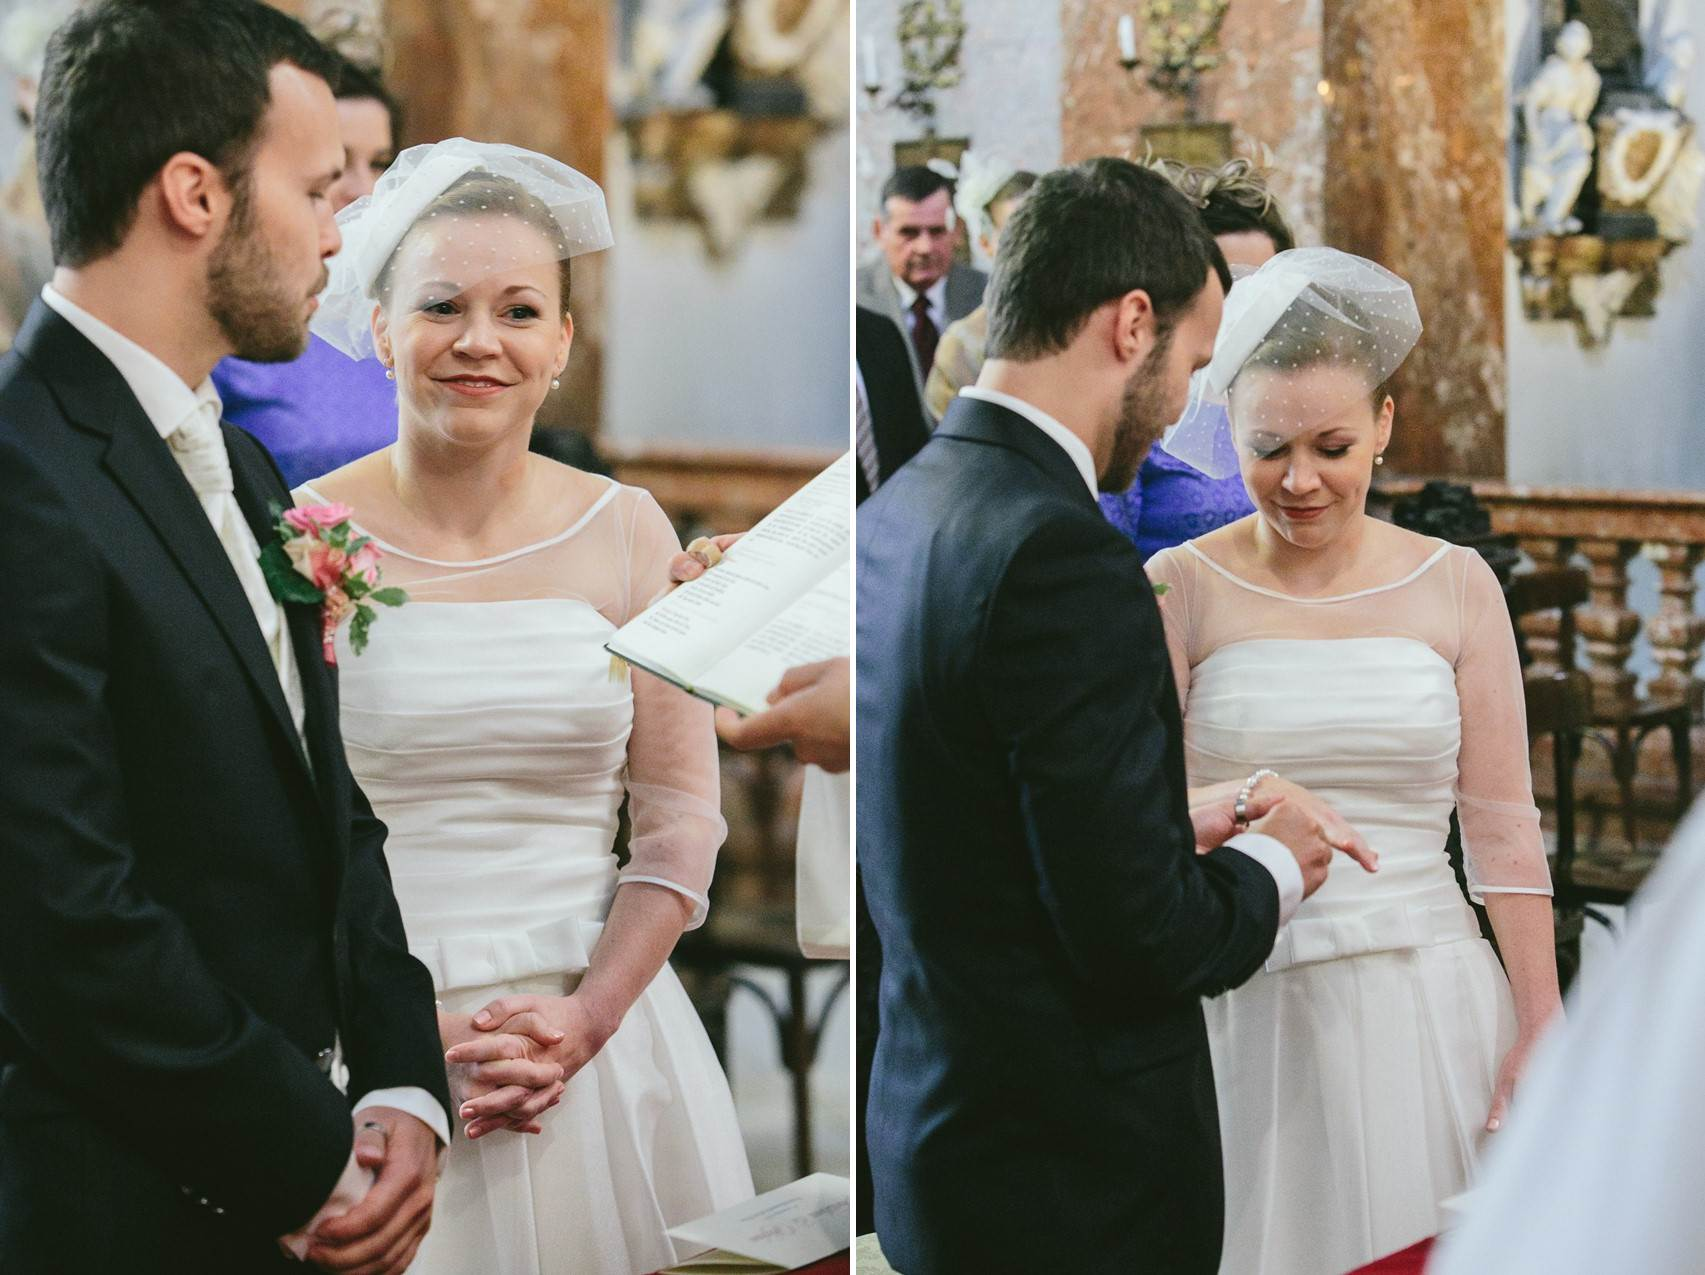 Wedding Ceremony - A Sweet 1950s Infused Wedding with a Jackie Kennedy Inspired Wedding Dress